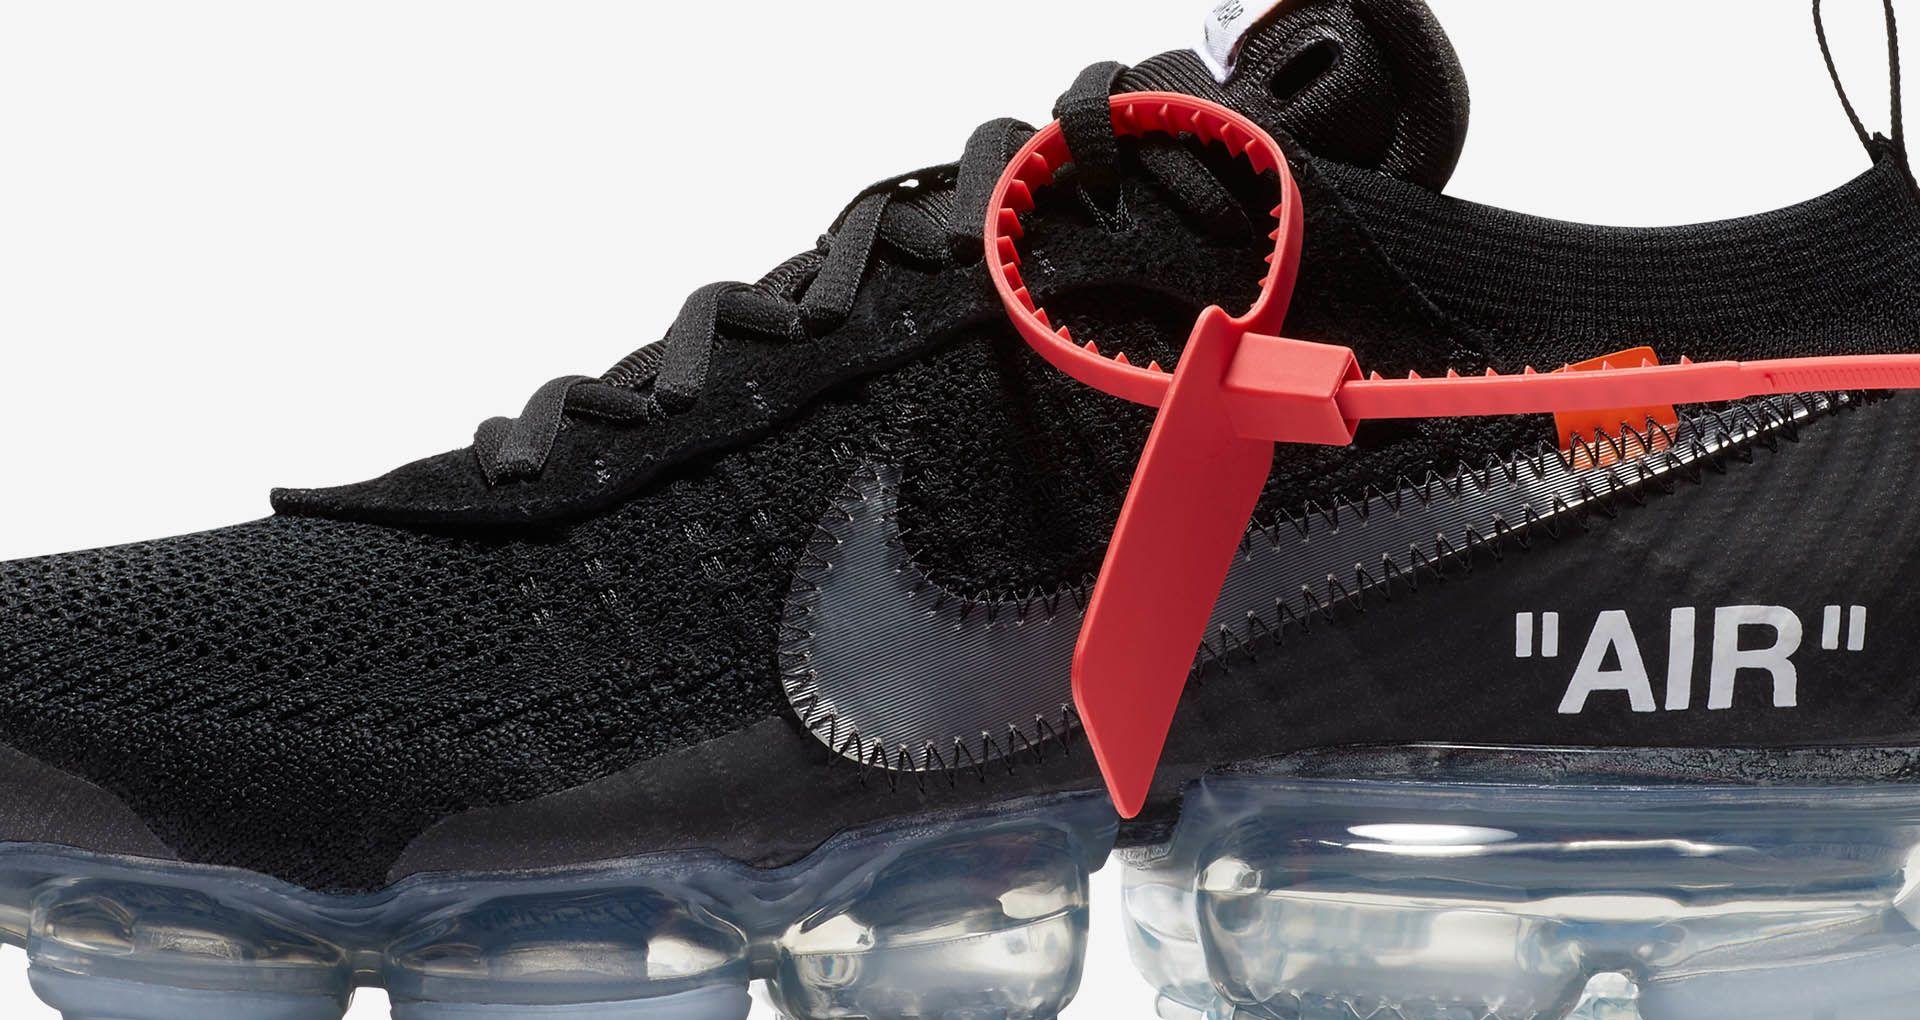 6e5619572218 Nike The Ten Air Vapormax Off-White  Black  Release Date. Nike+ SNKRS